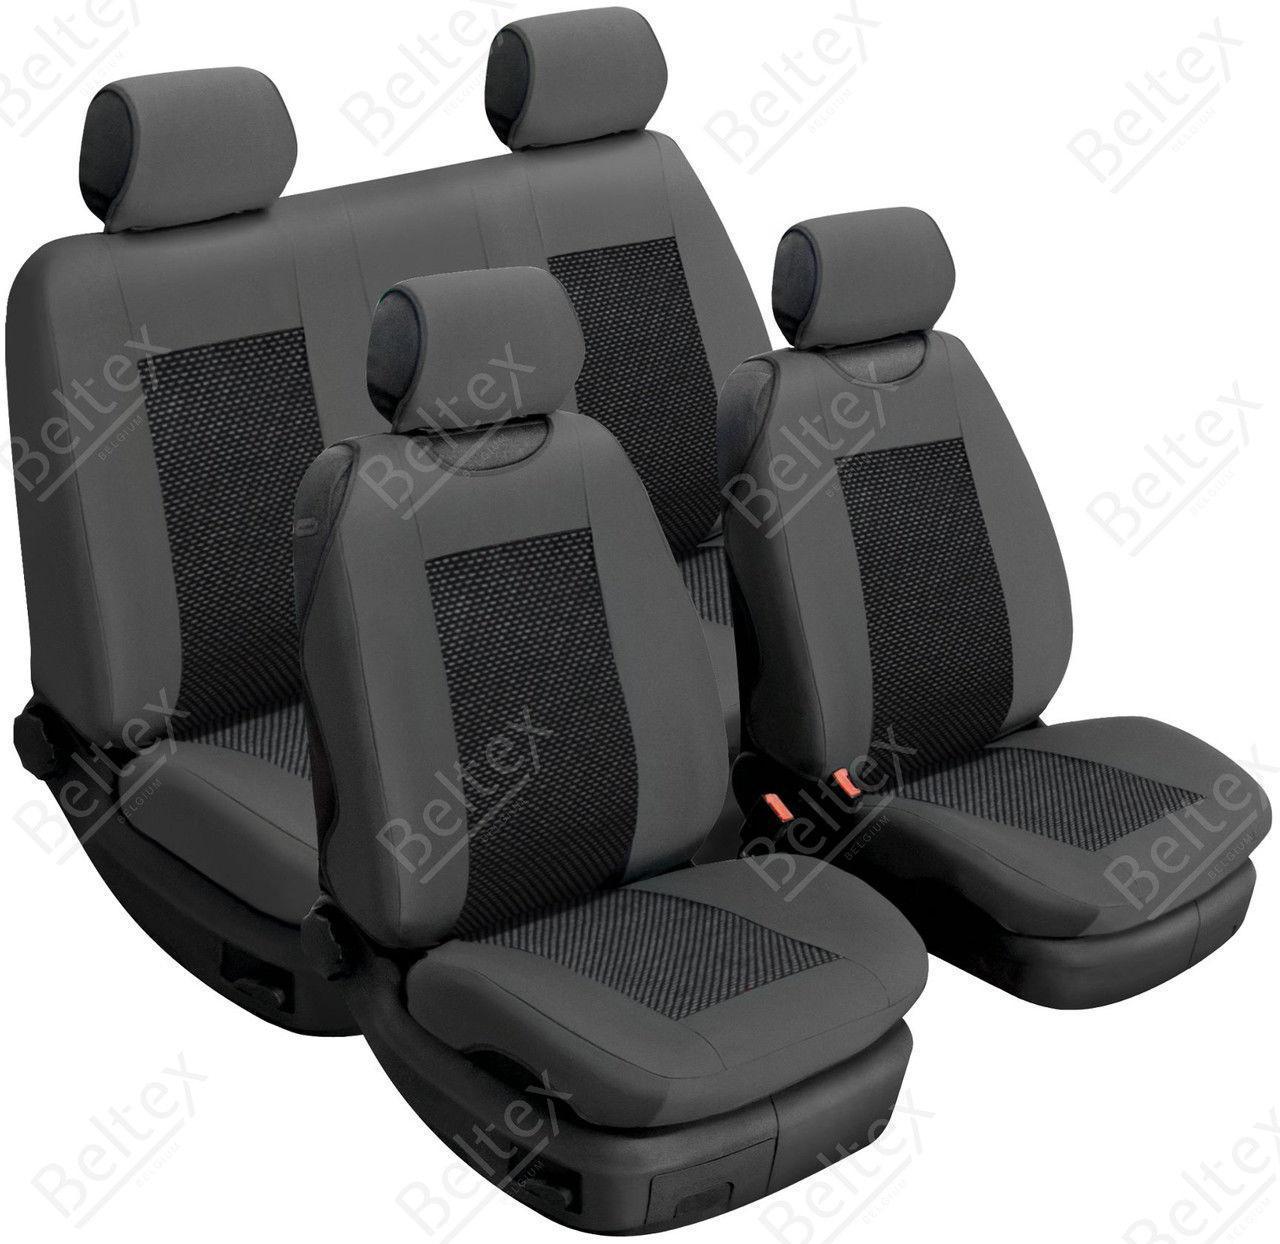 Майки/чехлы на сиденья Хендай Акцент 2 (Hyundai Accent II)